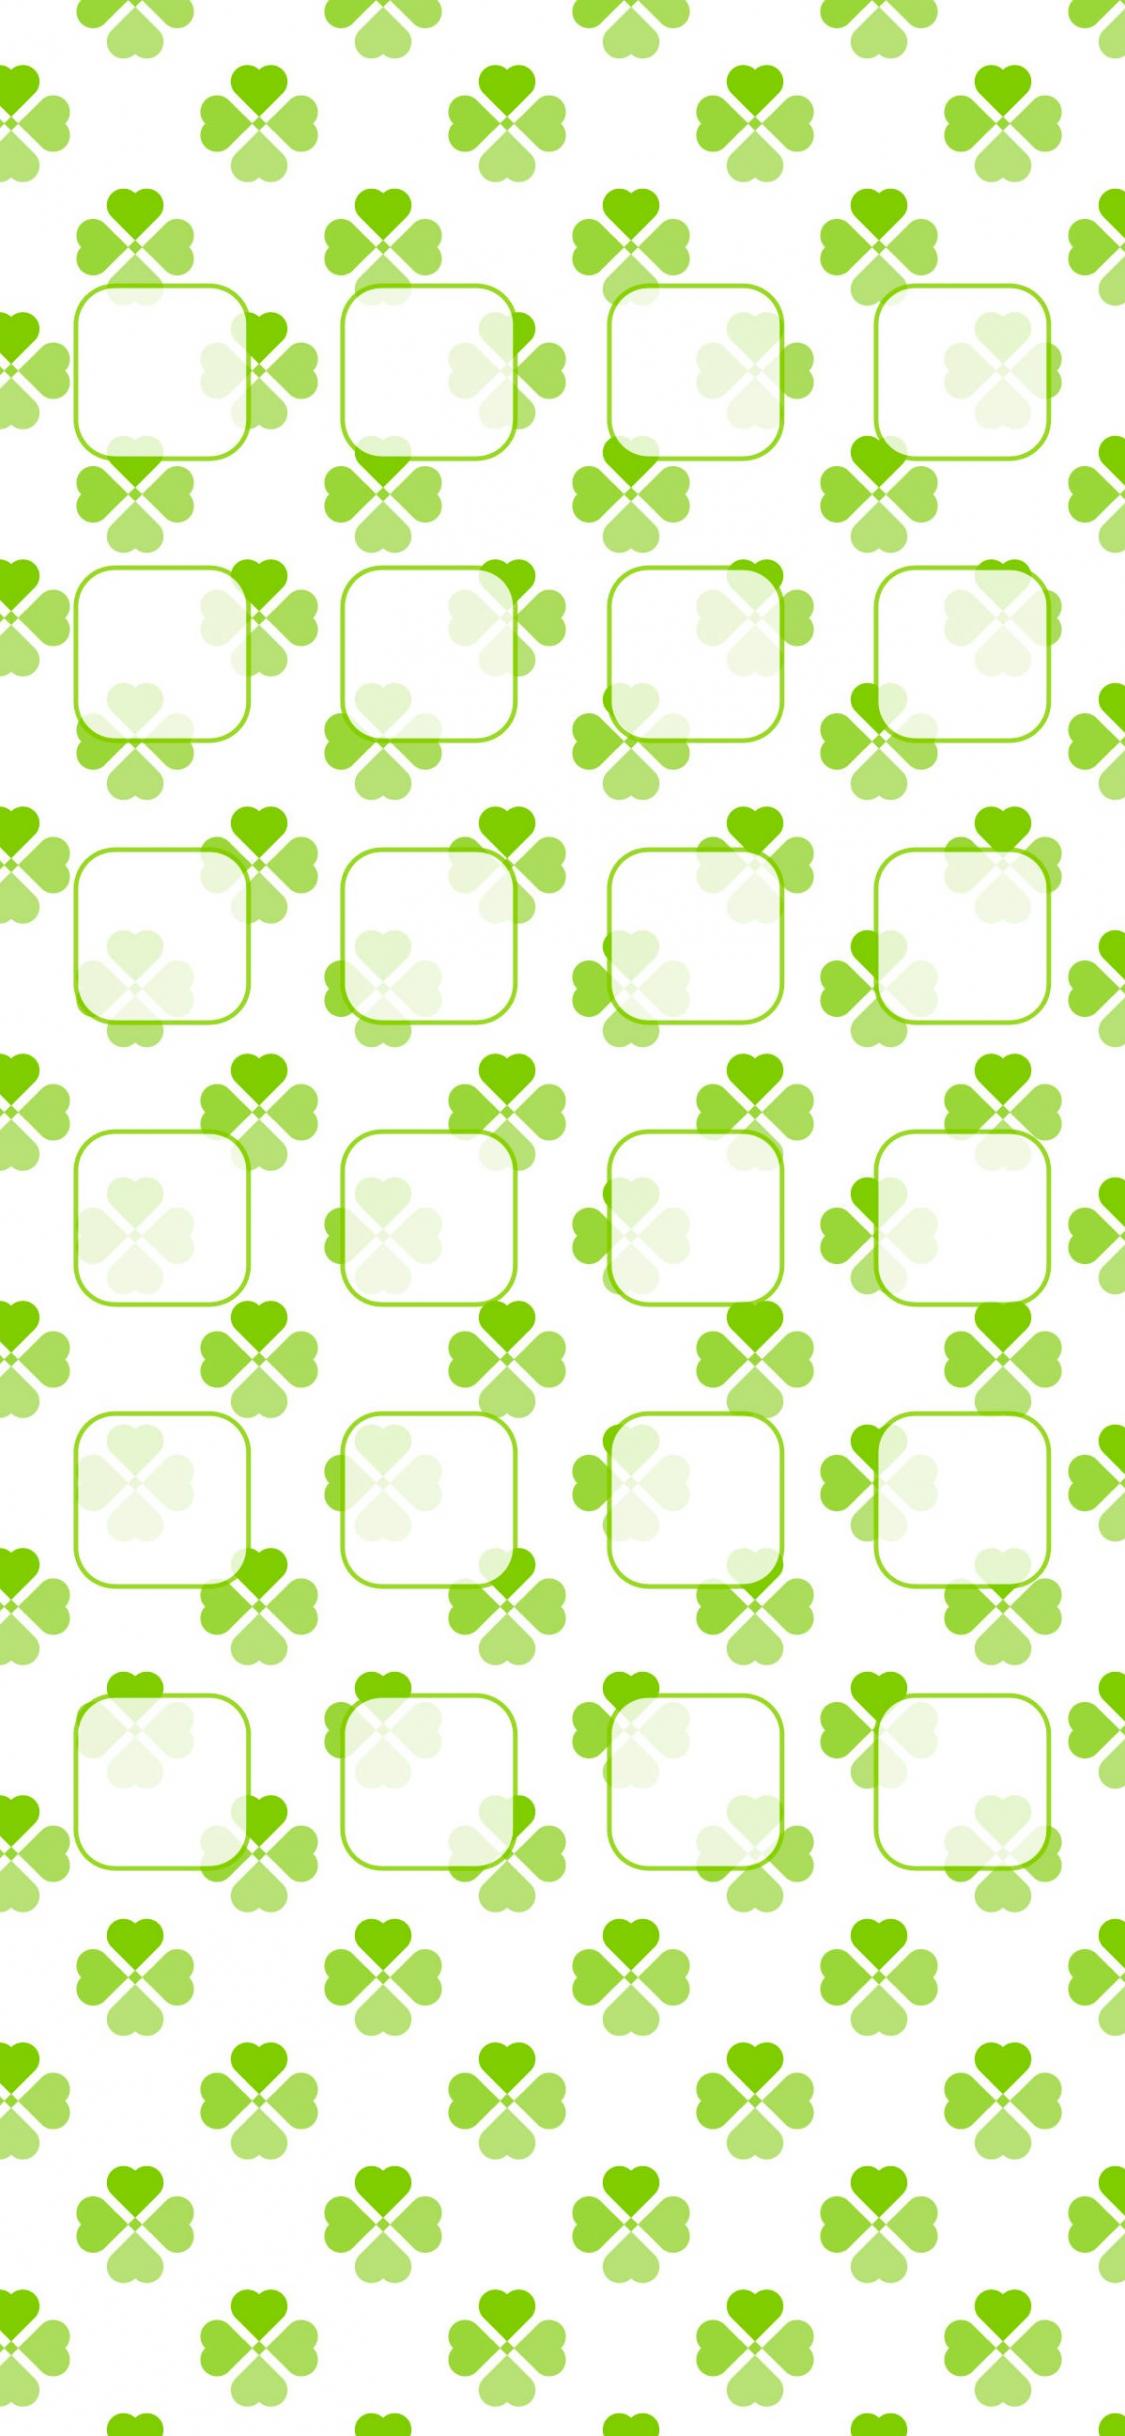 Free Download Clover Pattern For Girls Shelf Green Wallpapersc